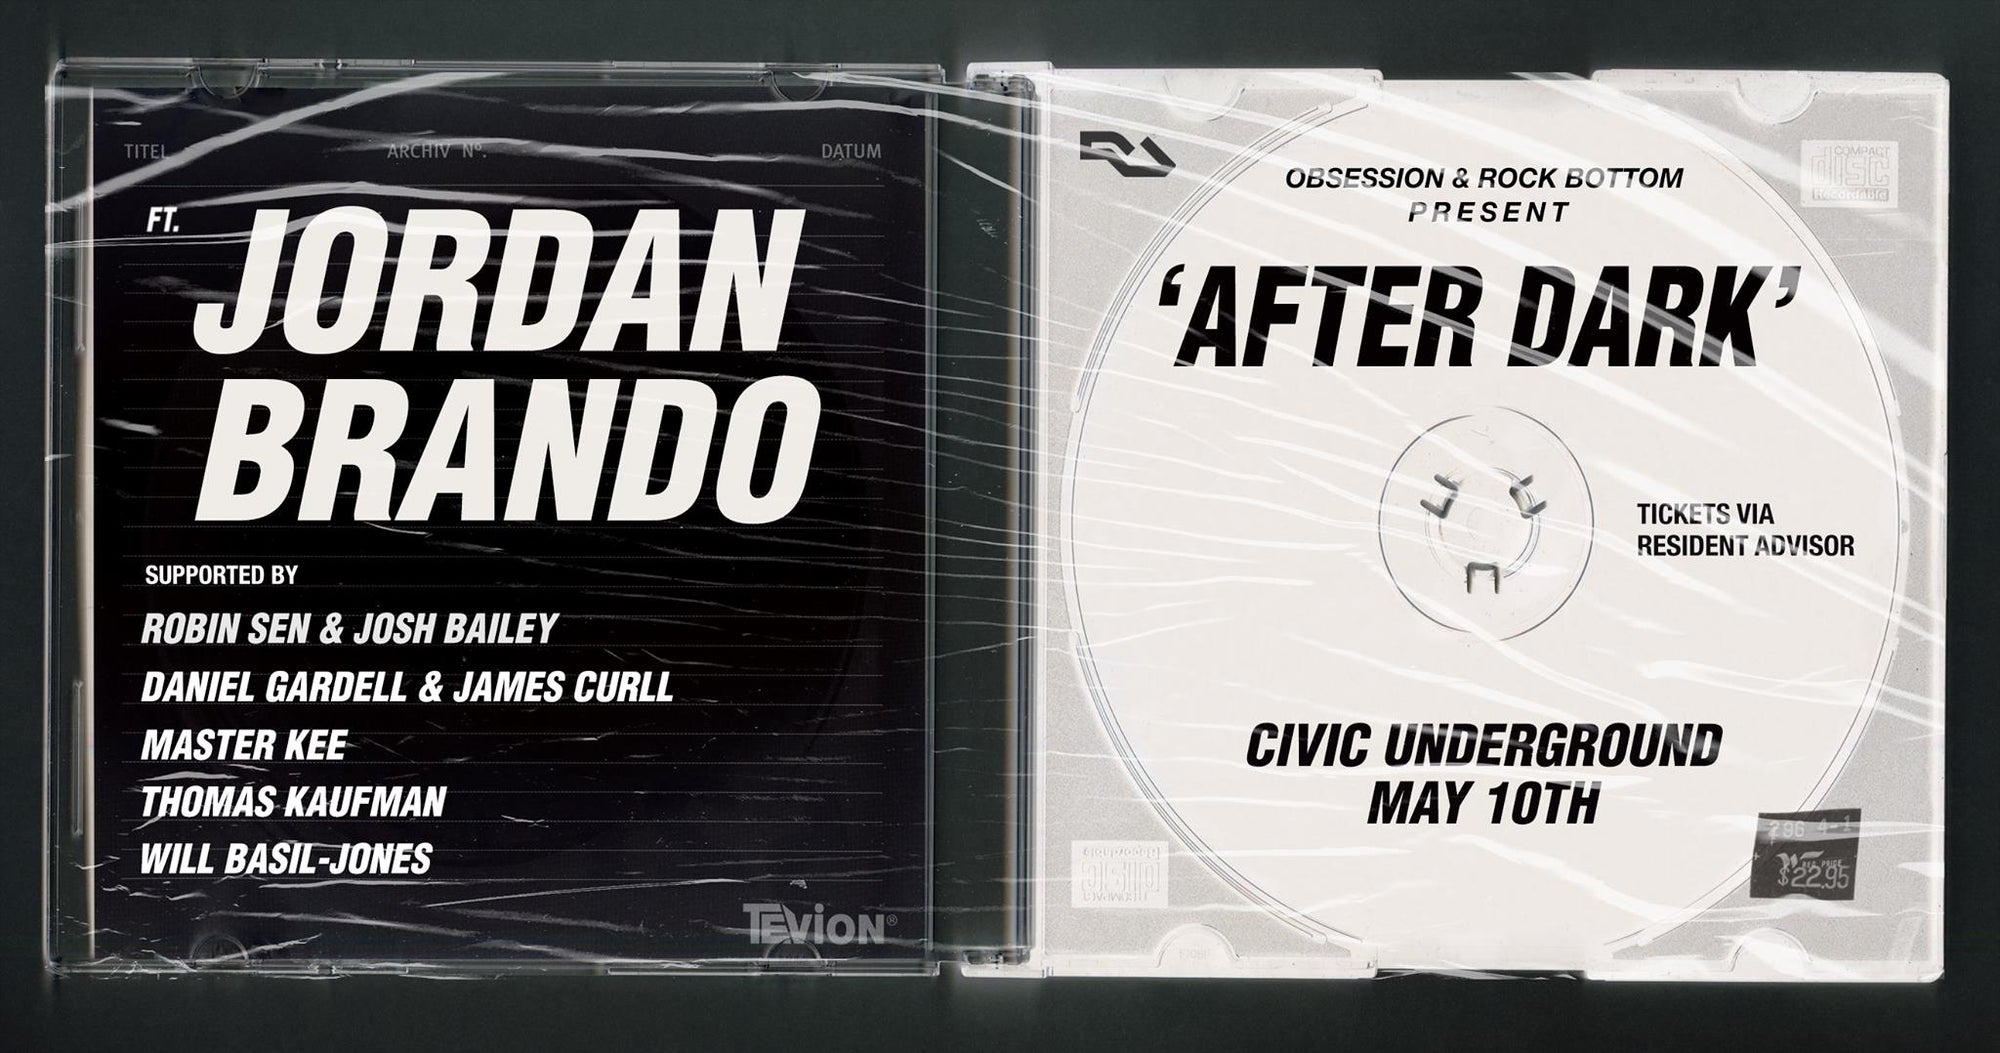 Jordan Brando Obsession Events Civic Underground Rock Bottom Events - Sydney